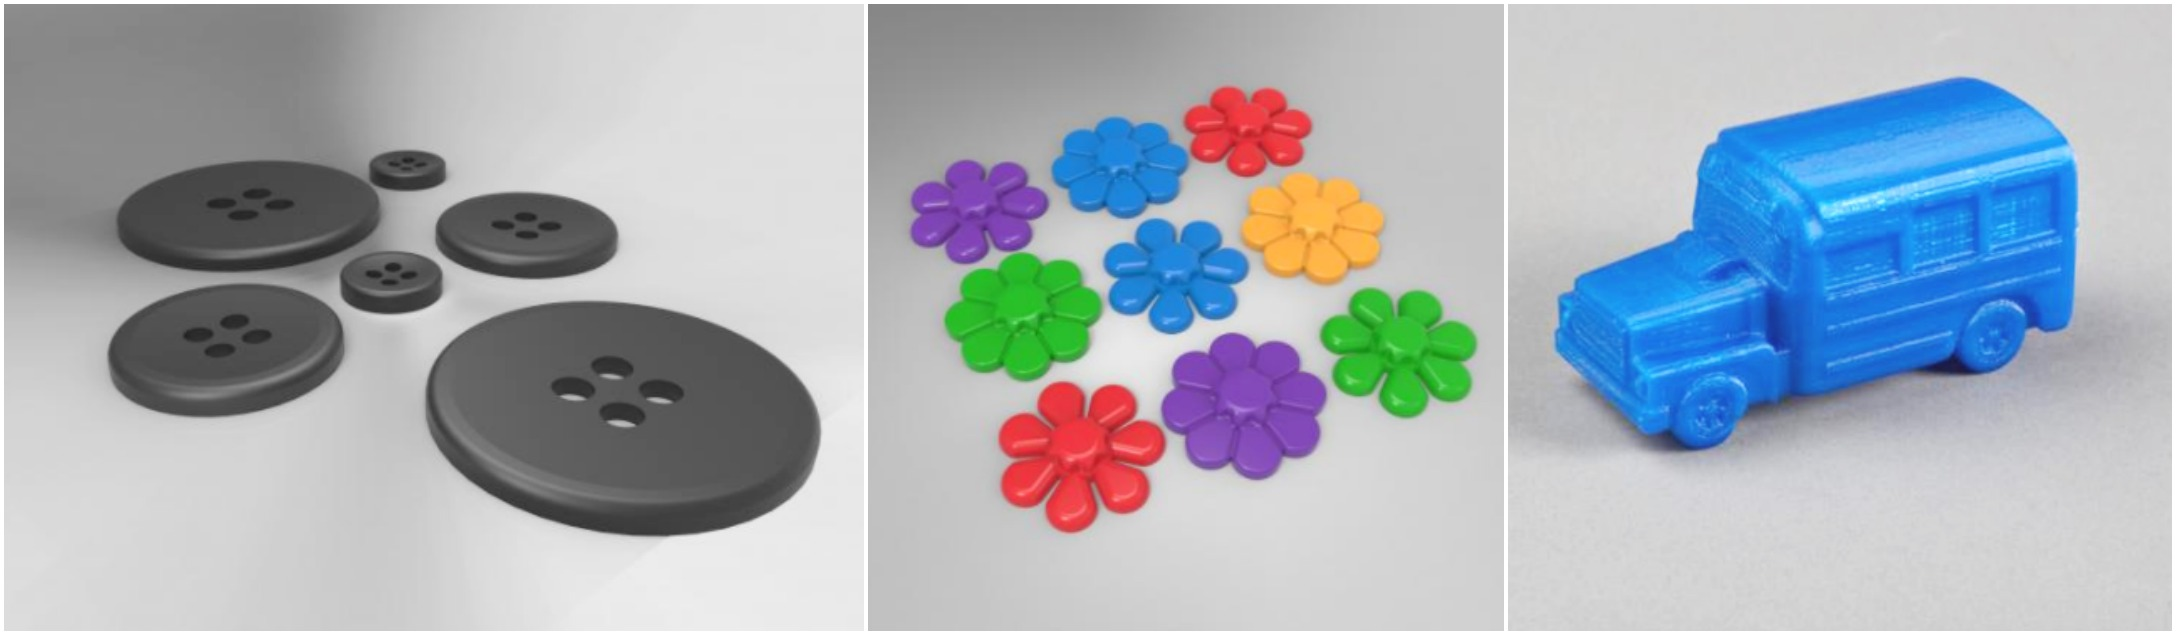 Classroom Manipulatives & Sensory Bins 3D Printing Models